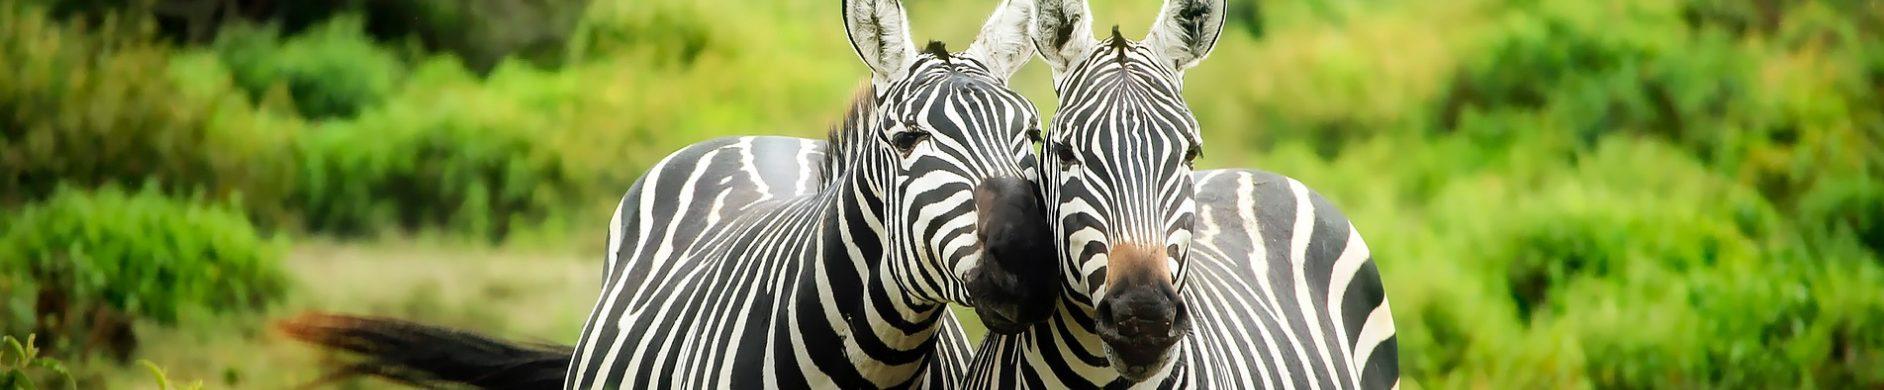 Kenya+Safari+zèbre+Voyage+Sur-mesure+Matins+Monde - Les matins du monde